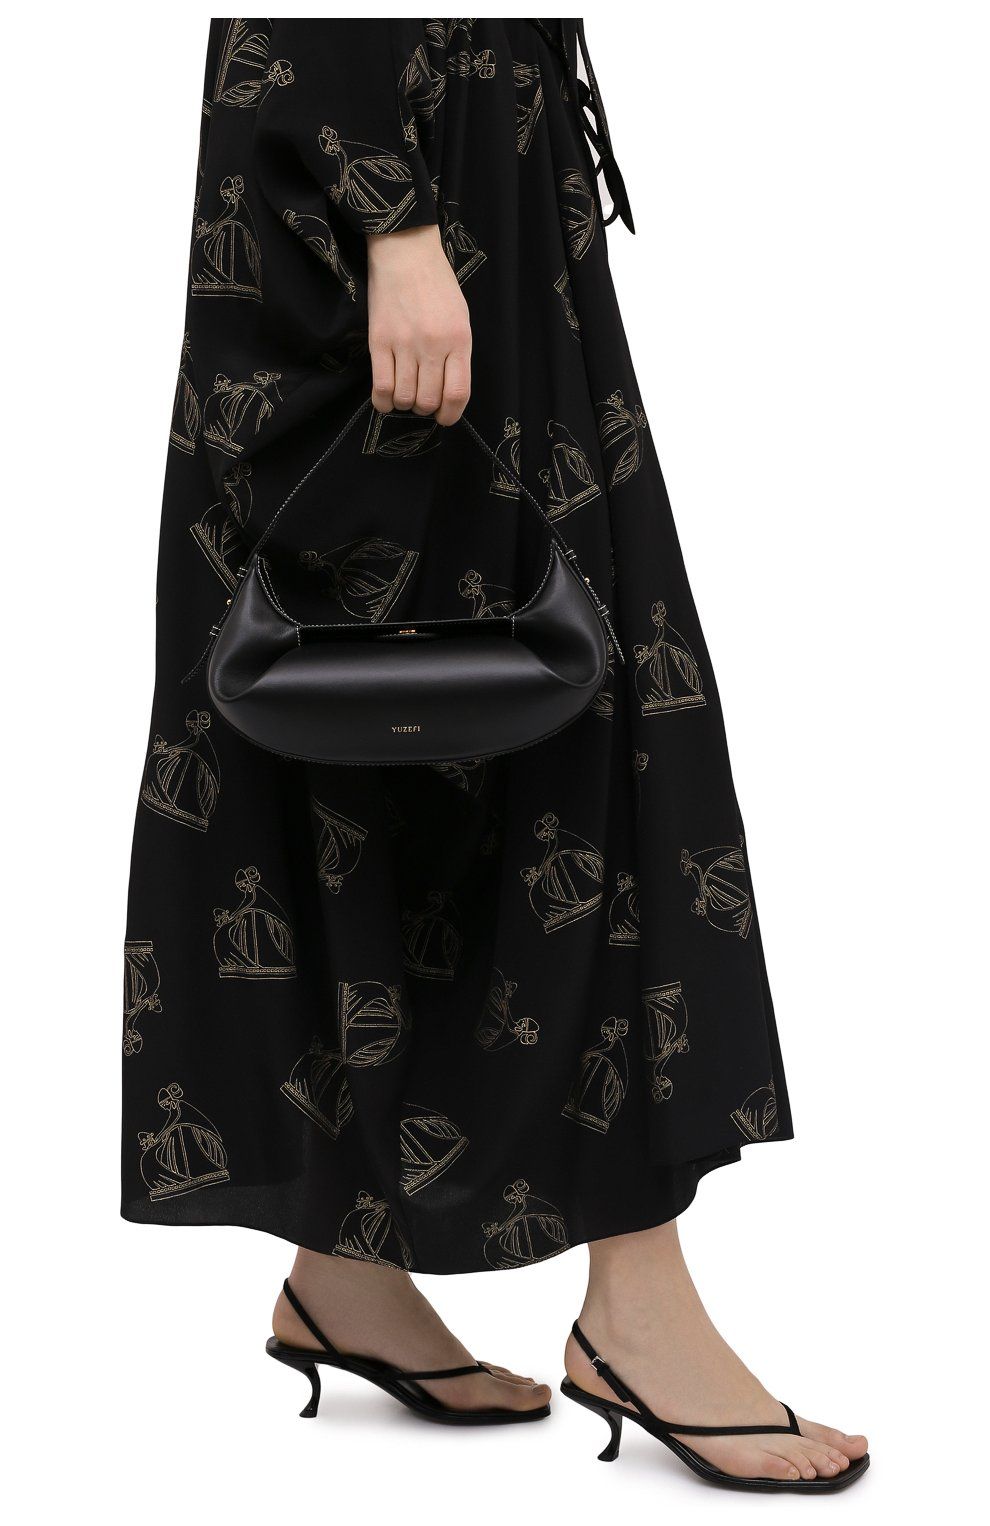 Женская сумка fortune cookie YUZEFI черного цвета, арт. YUZC0-HB-FC-00   Фото 2 (Сумки-технические: Сумки top-handle; Размер: medium; Материал: Натуральная кожа)